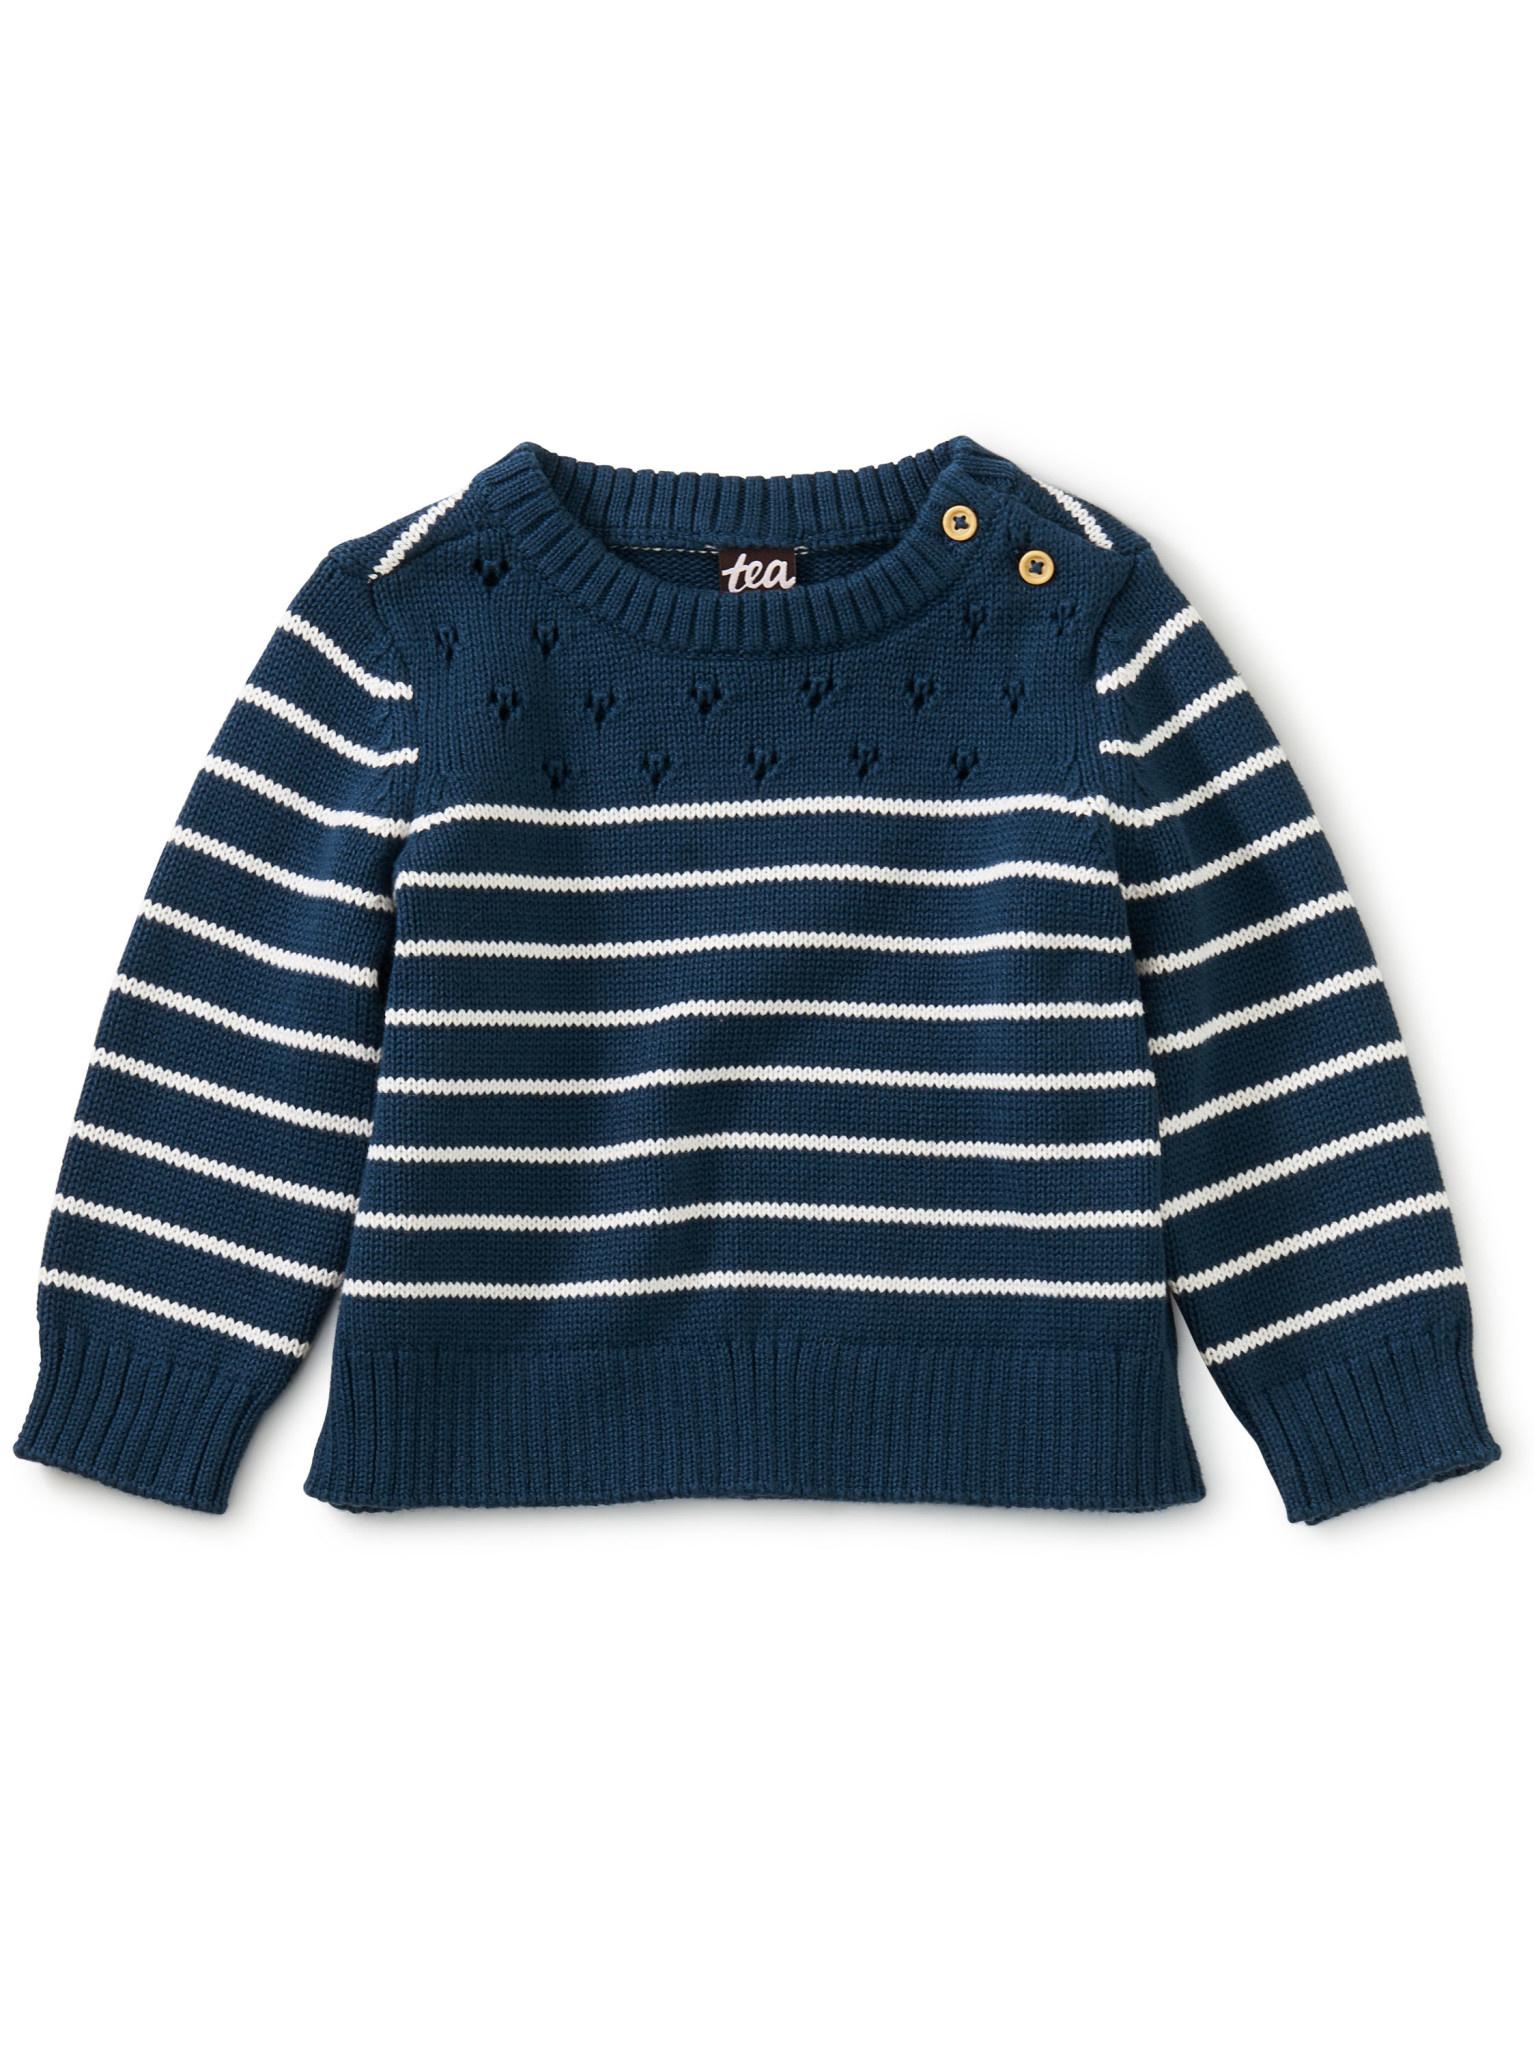 Tea Collection Breton Stripe Baby Sweater - Whale Blue